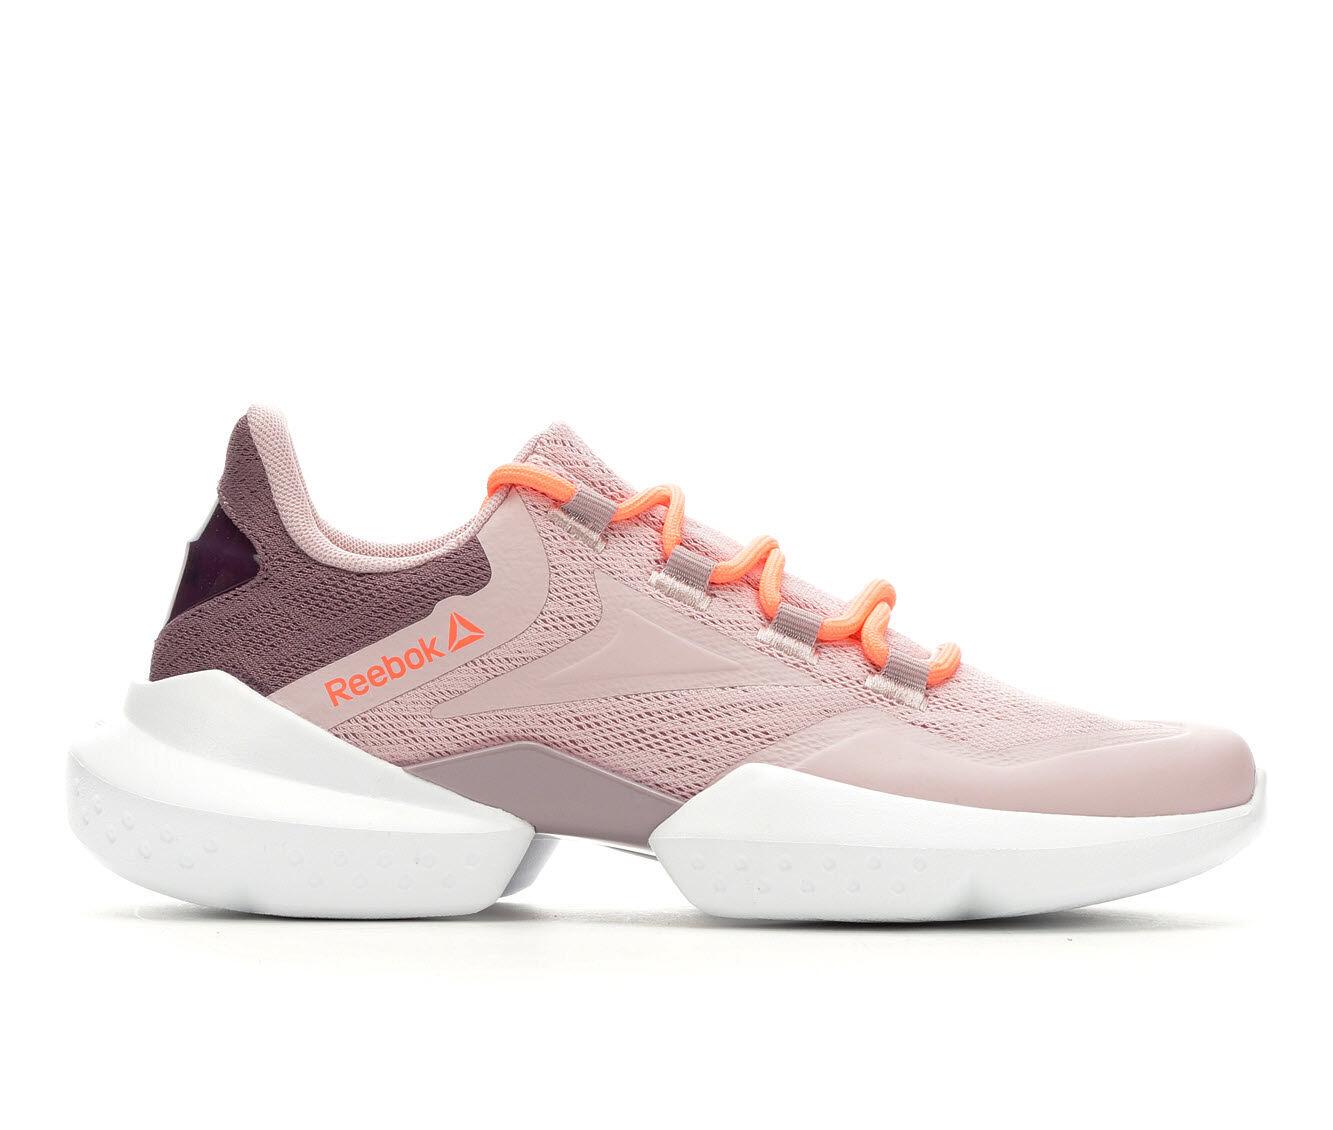 uk shoes_kd4502